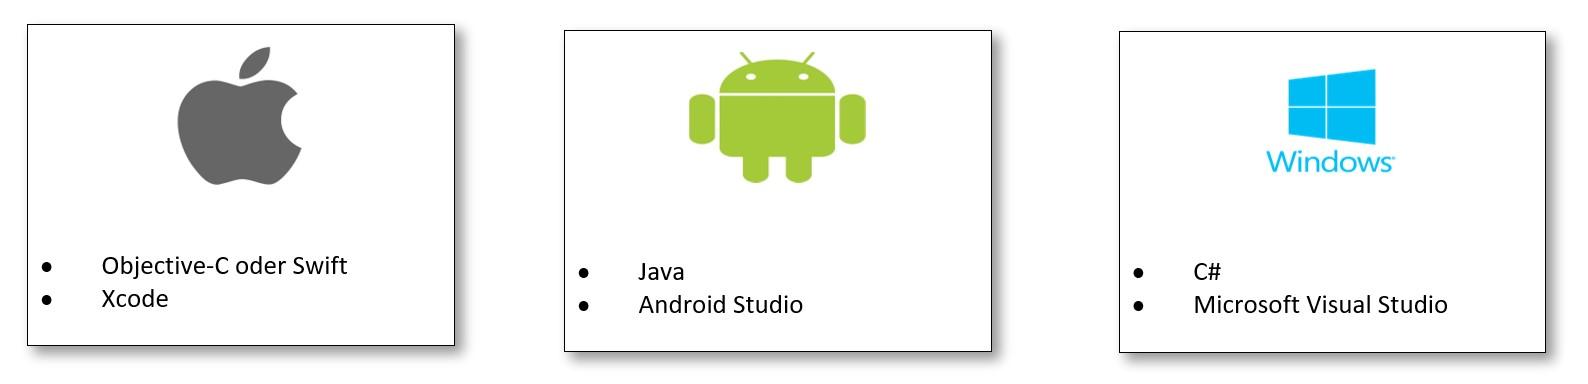 Développement d'applications mobiles avec Xamarin